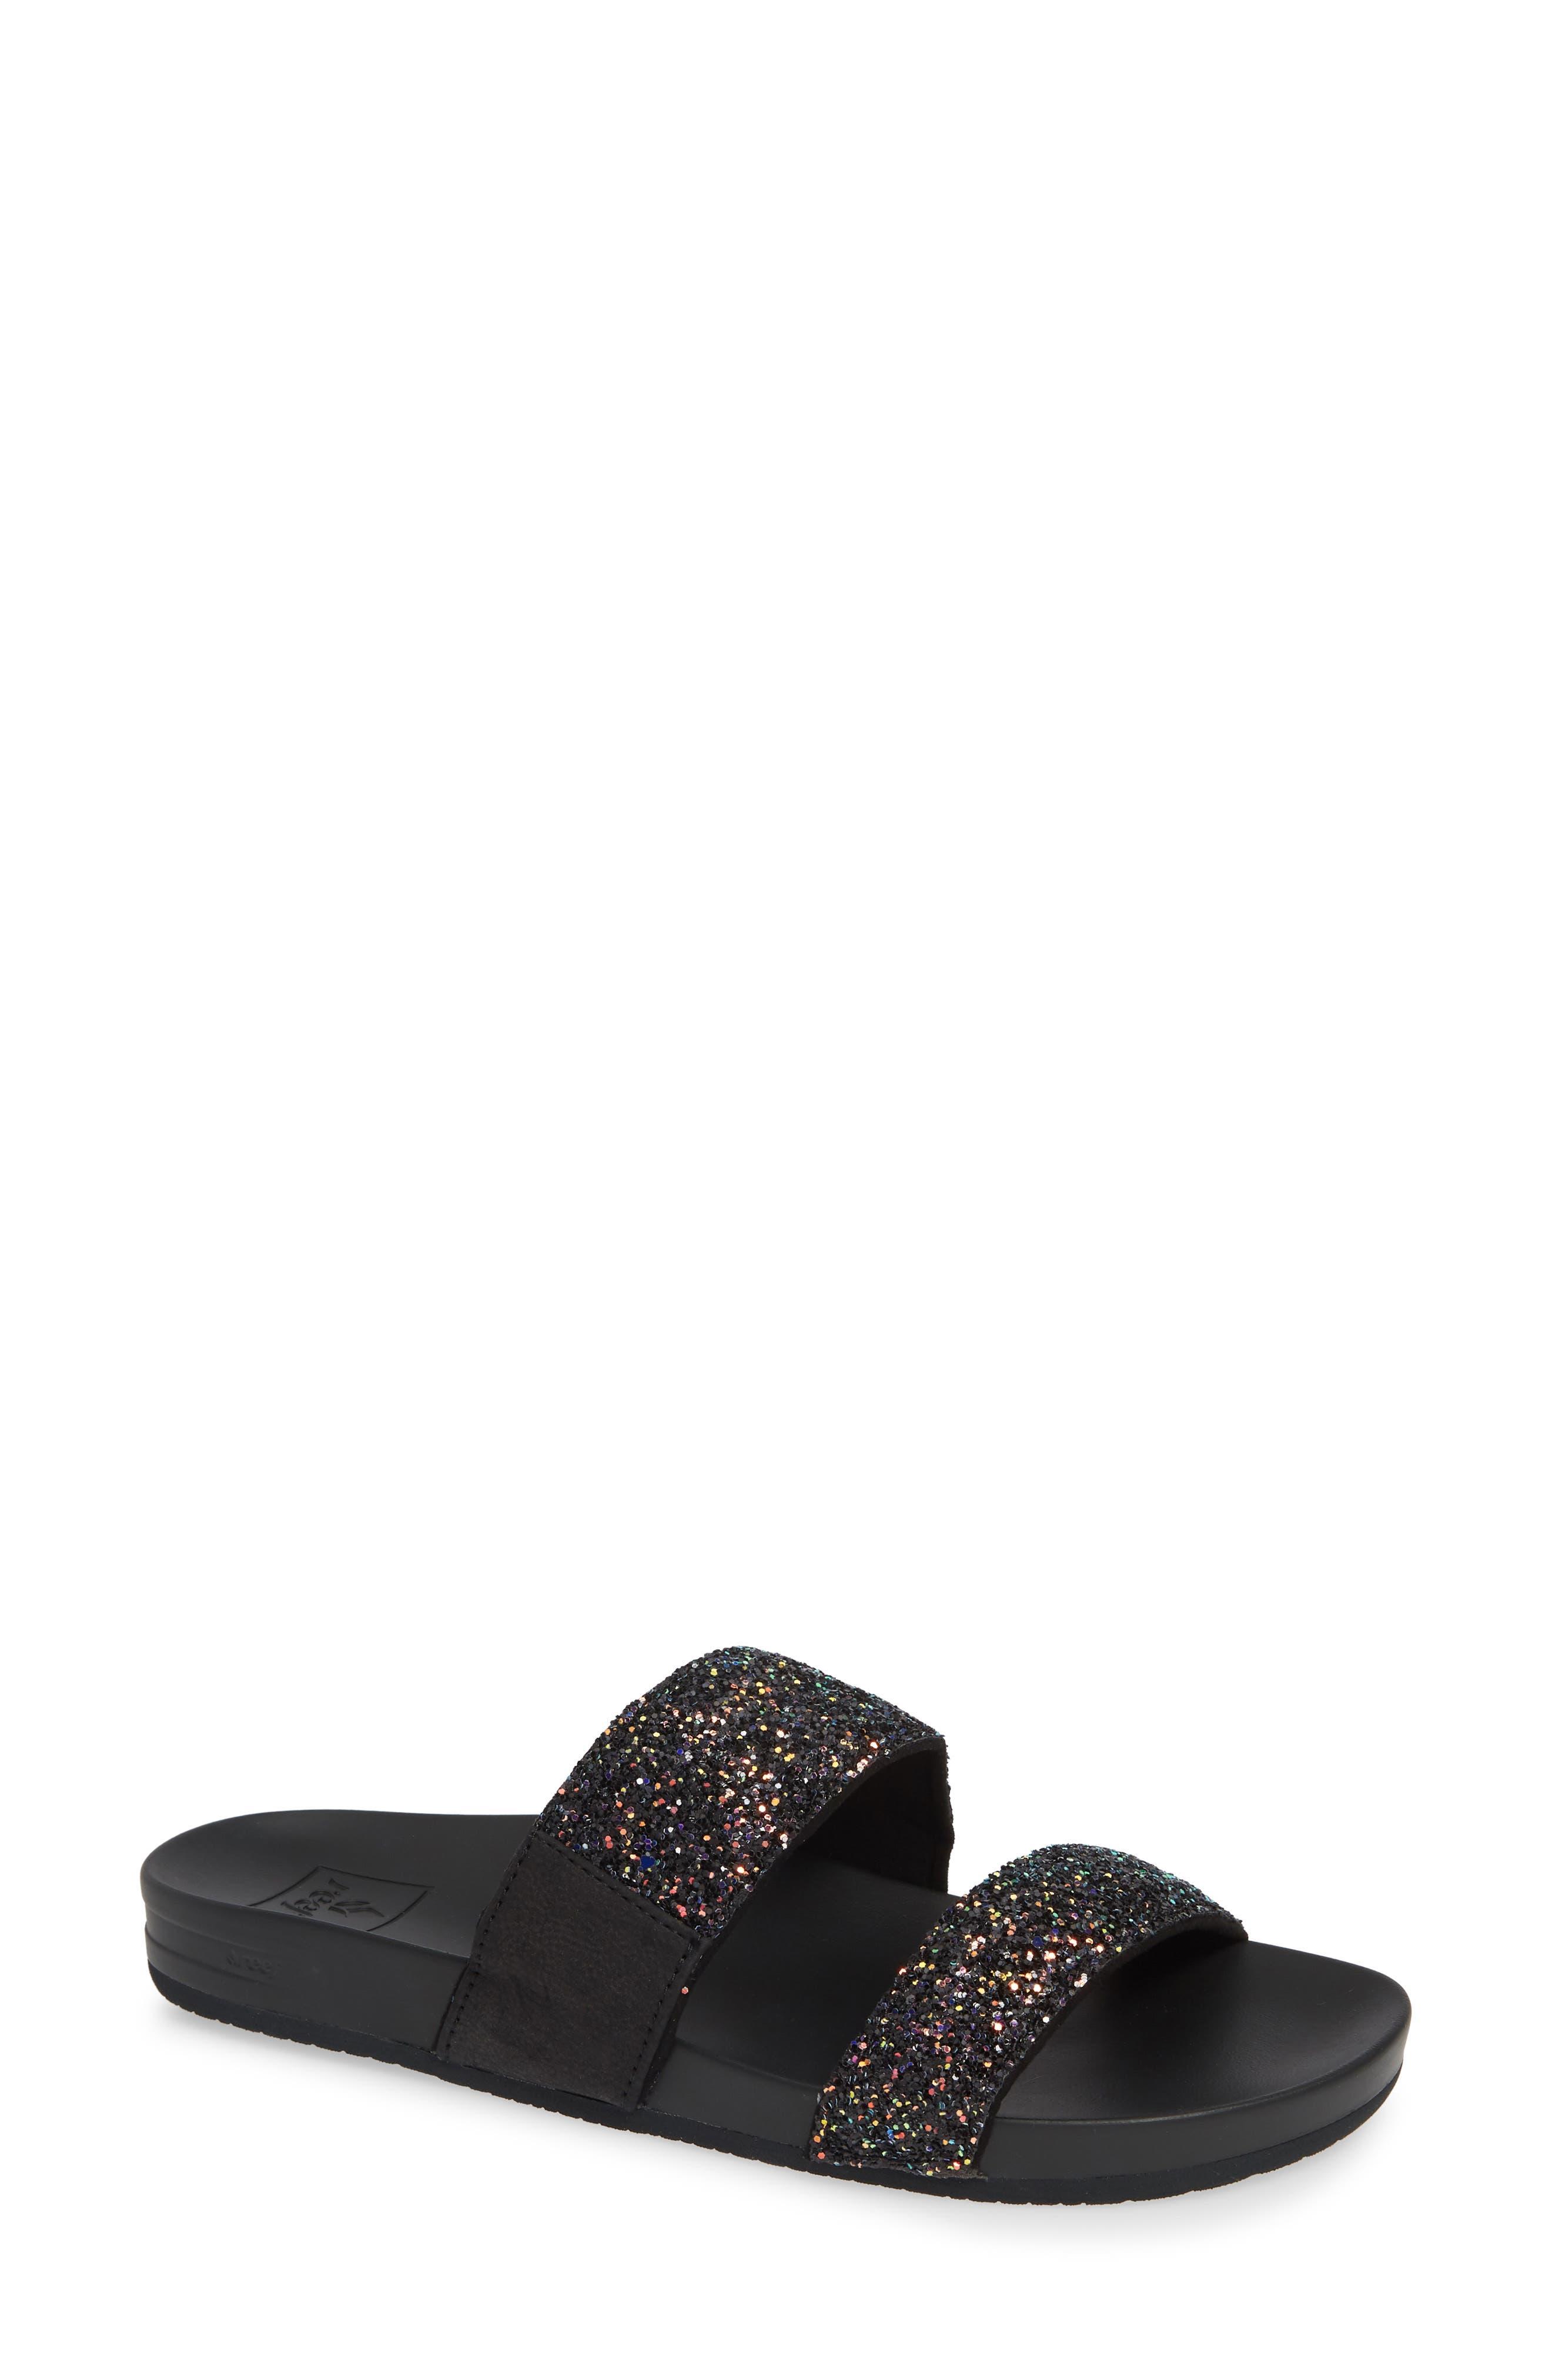 REEF Cushion Bounce Vista Slide Sandal, Main, color, POP ROCKS